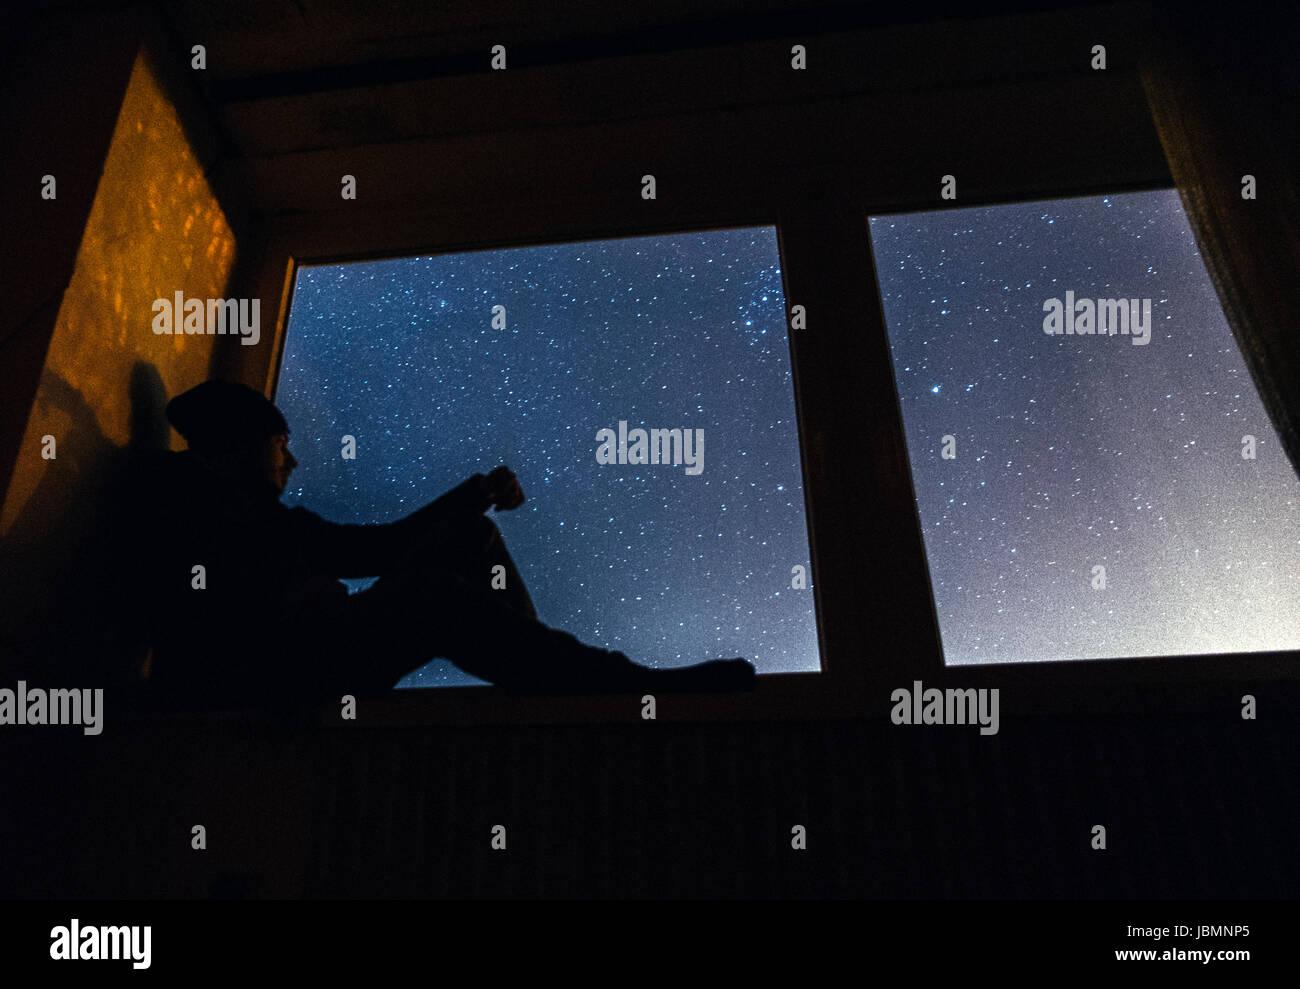 Man sitting in windows at night - Stock Image